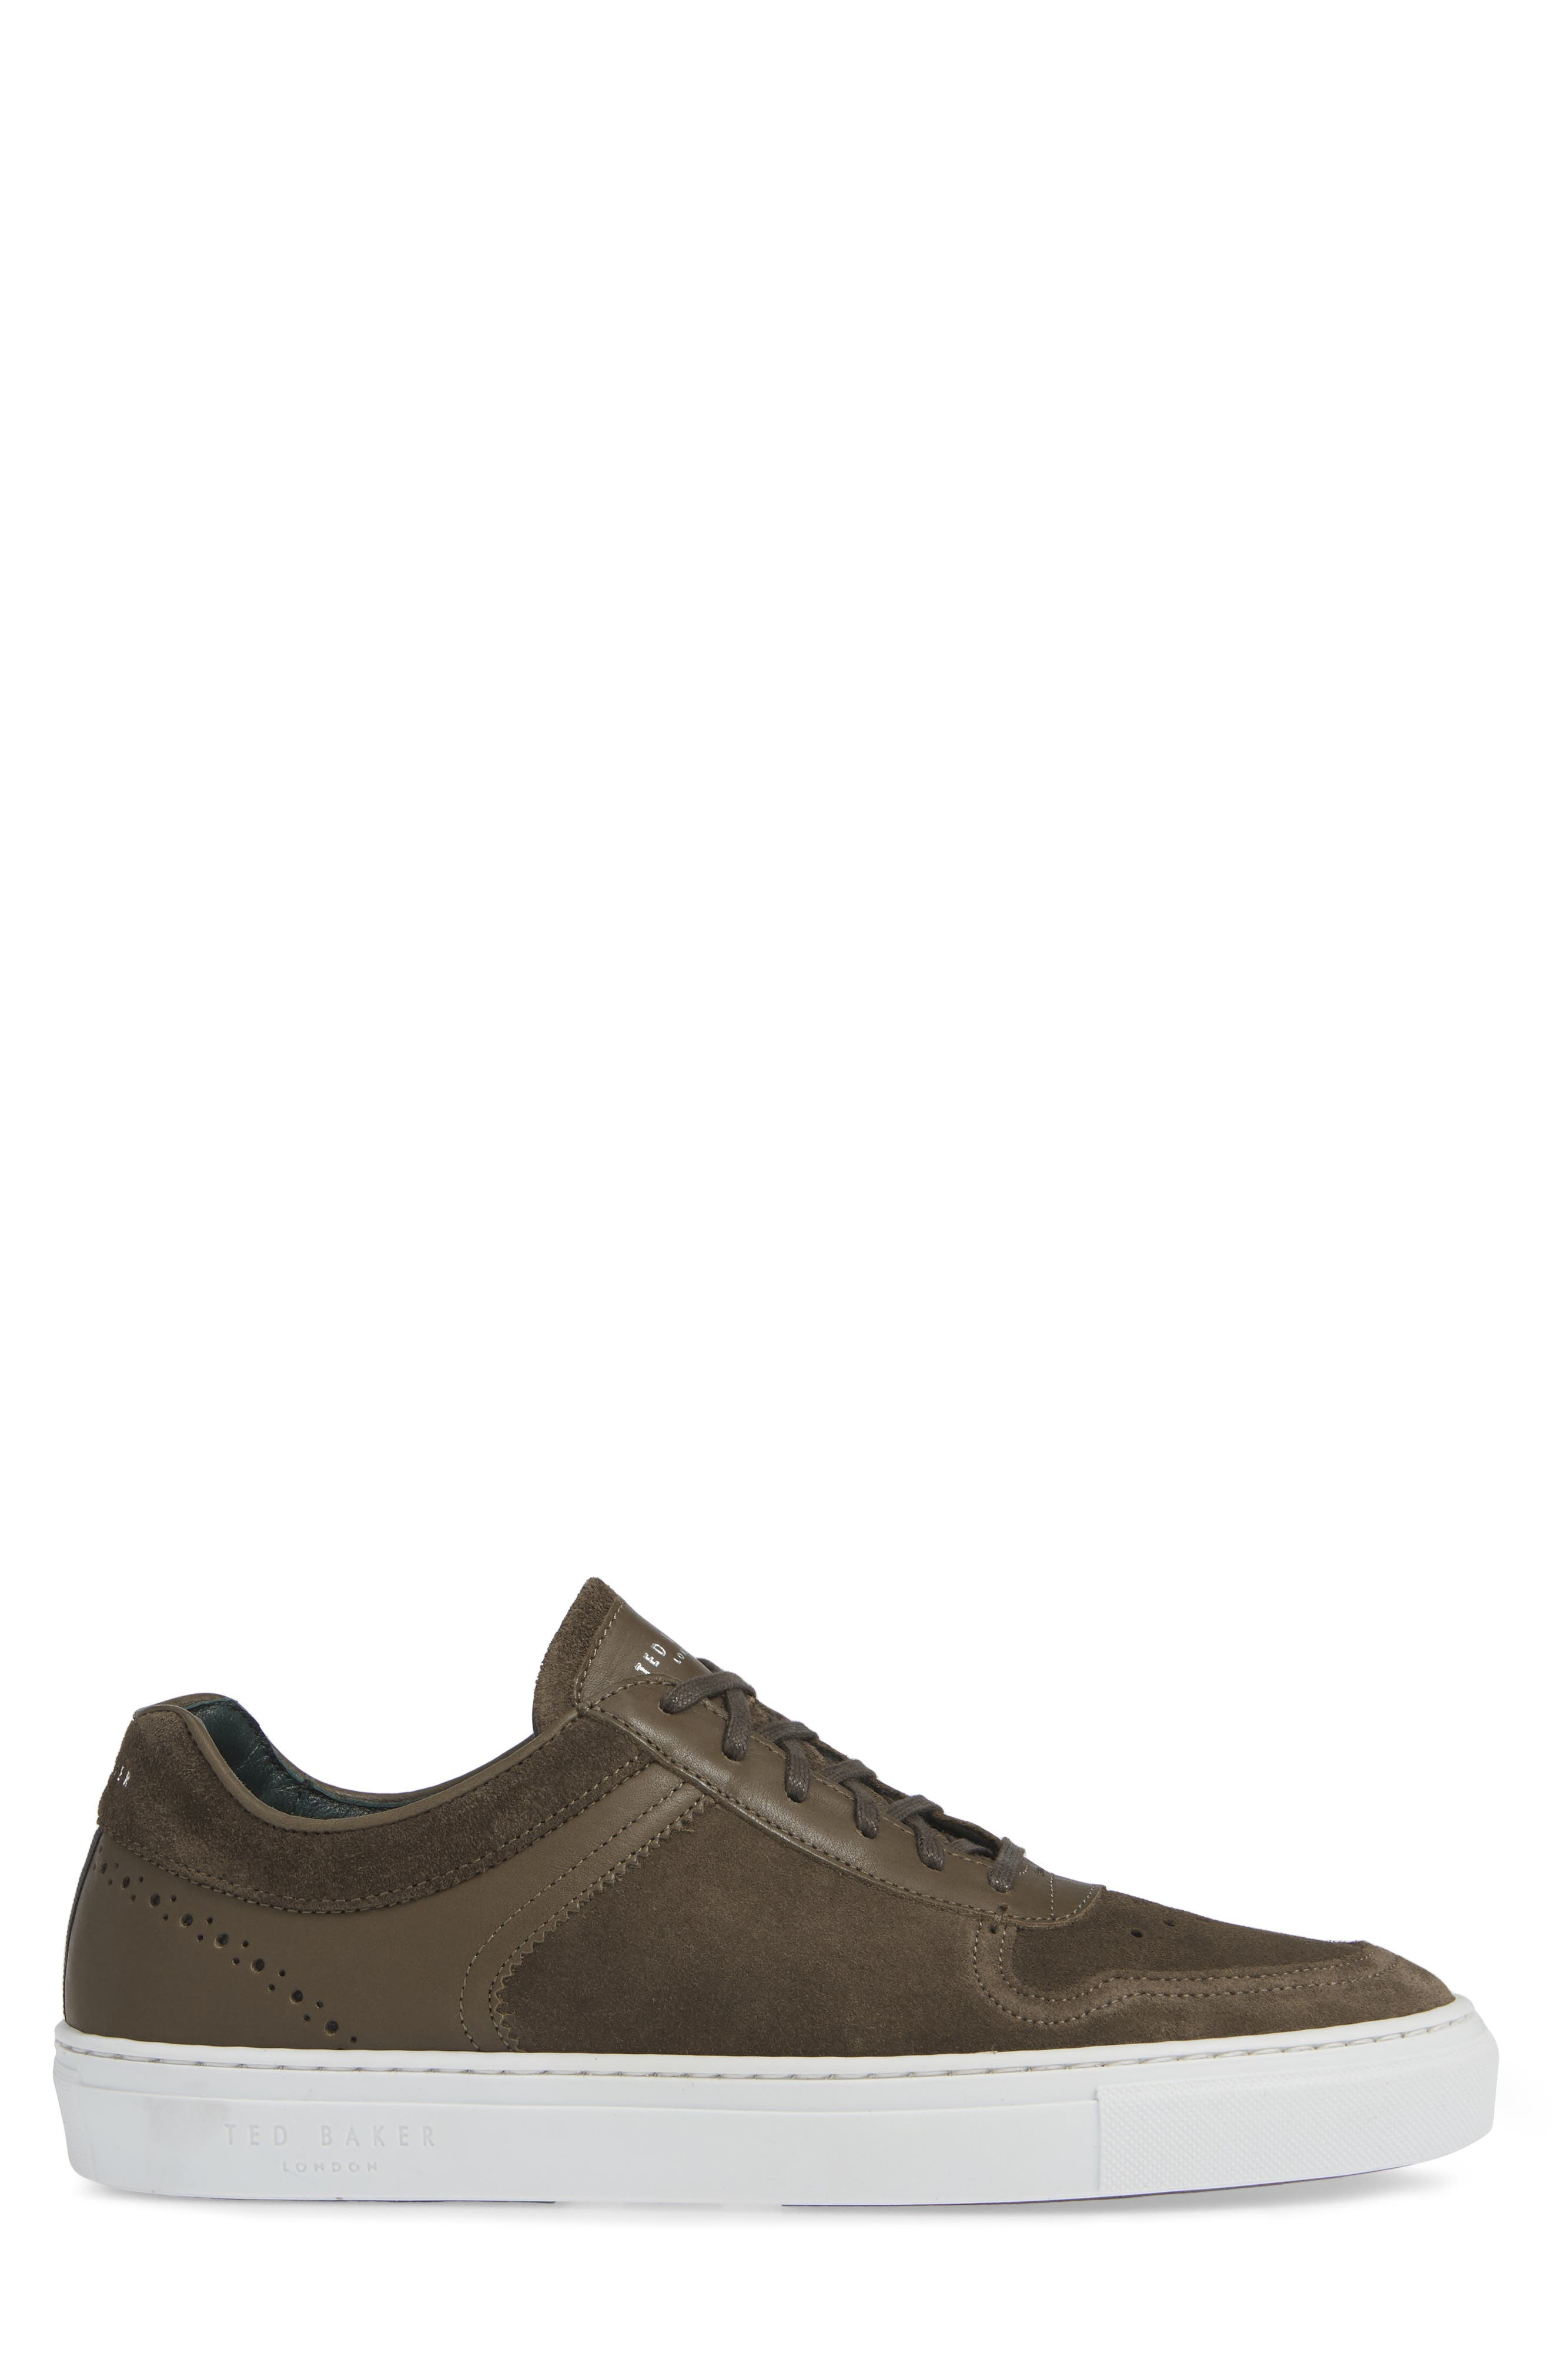 Burall Sneaker,                             Alternate thumbnail 3, color,                             DARK GREEN SUEDE